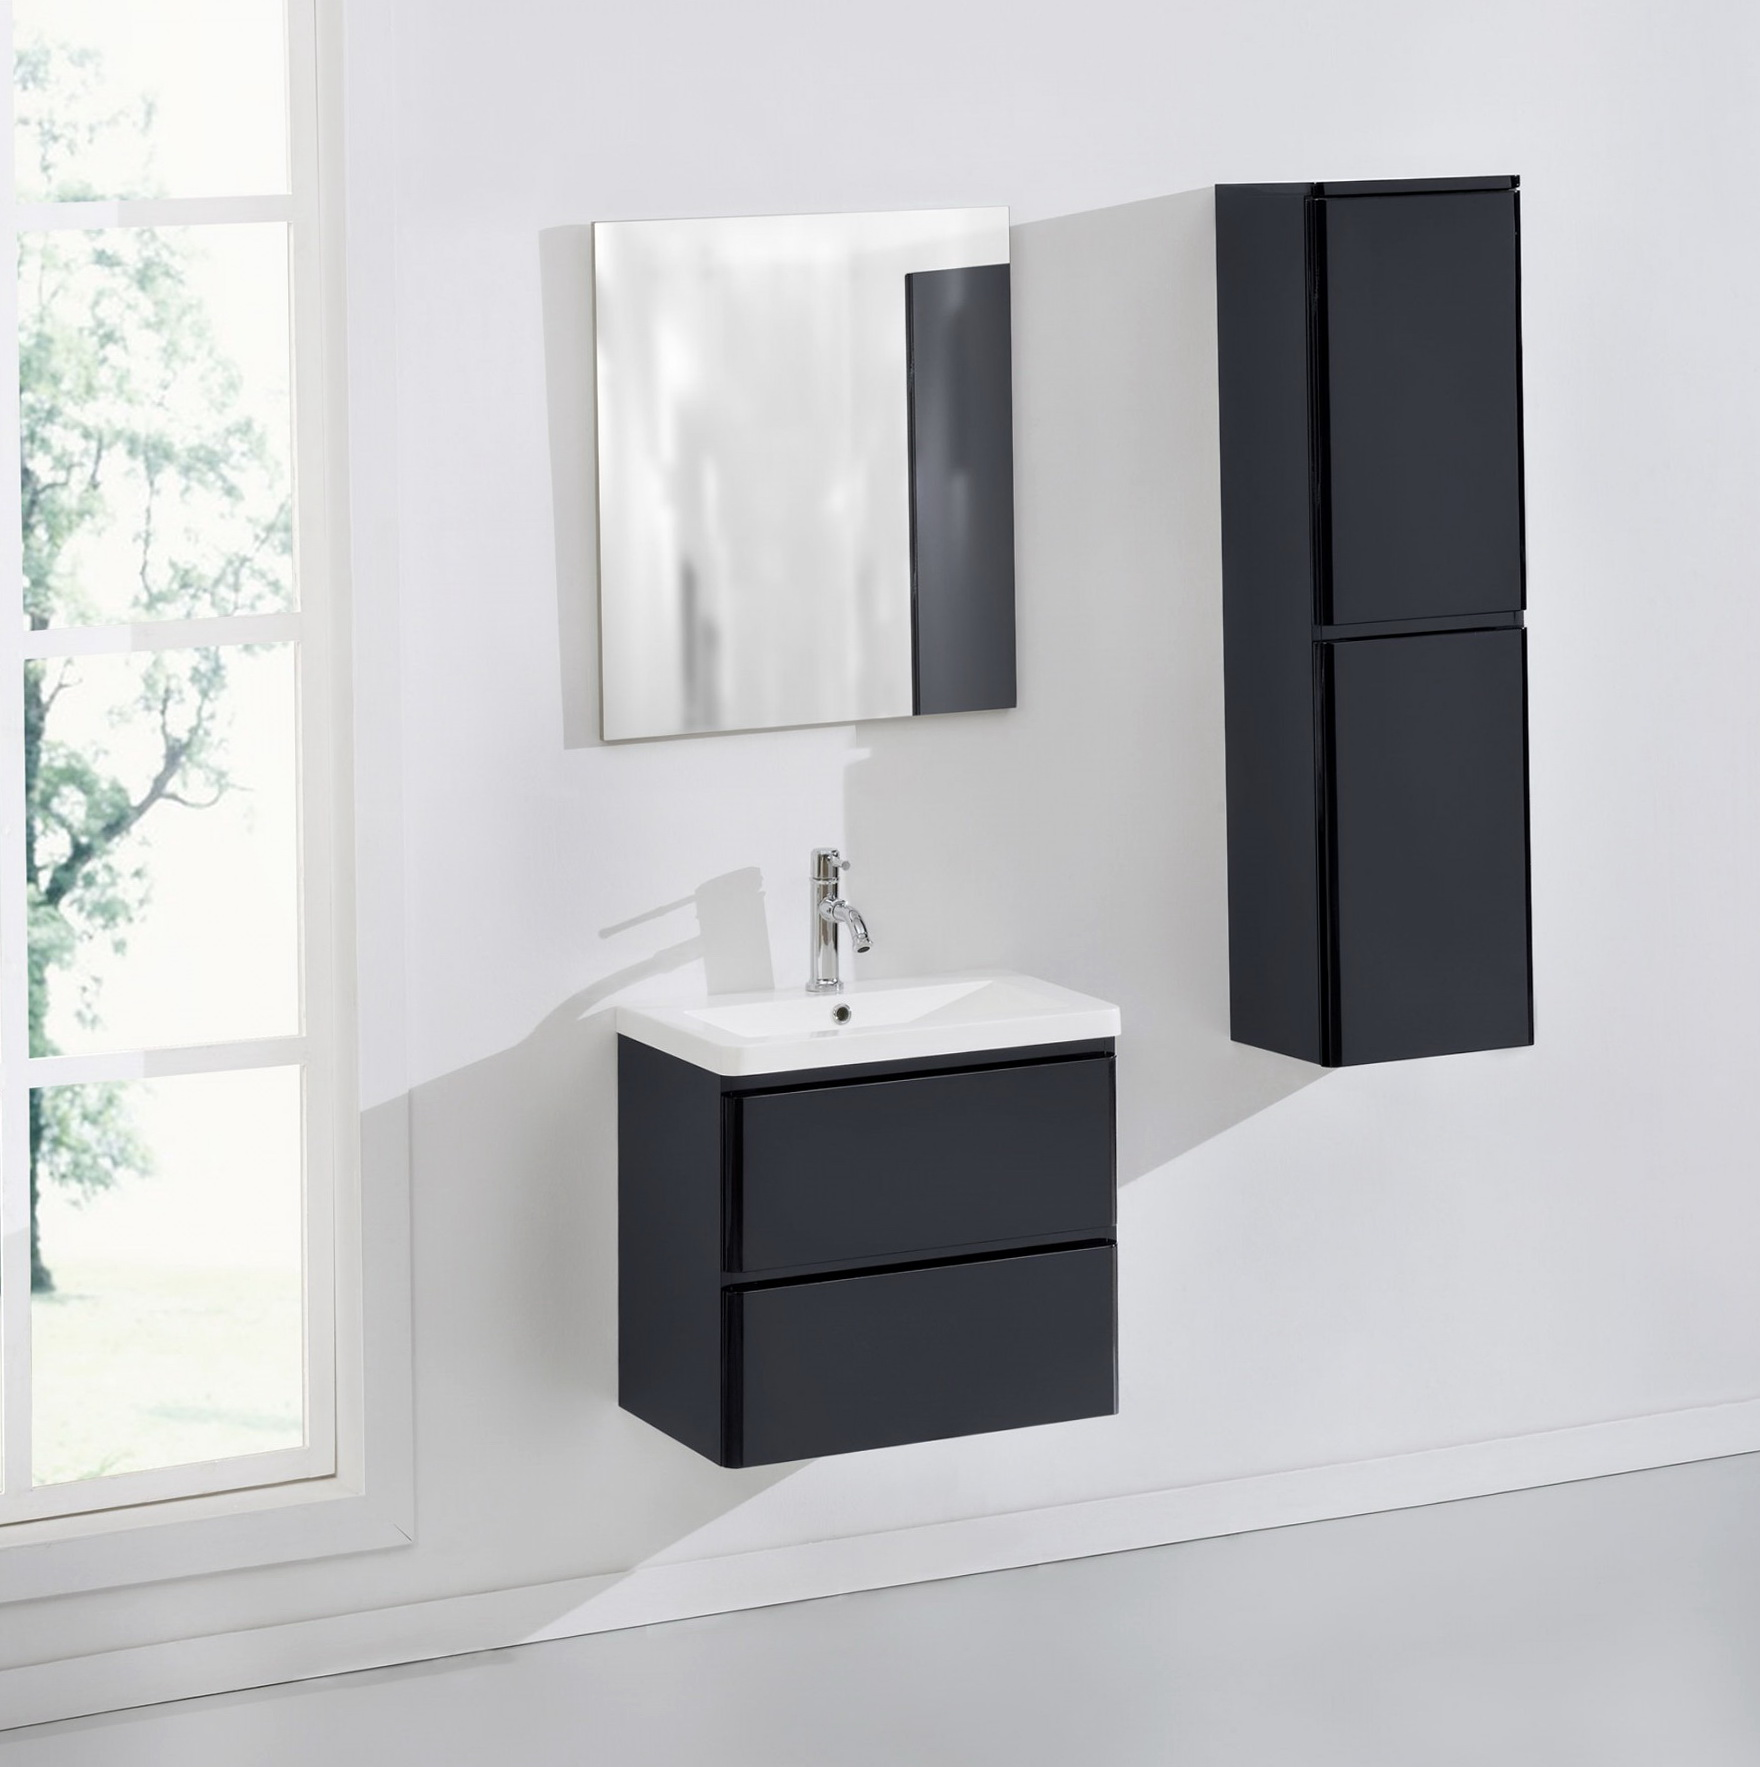 Wall Mounted Bathroom Vanity Units Uk   Home Design Ideas